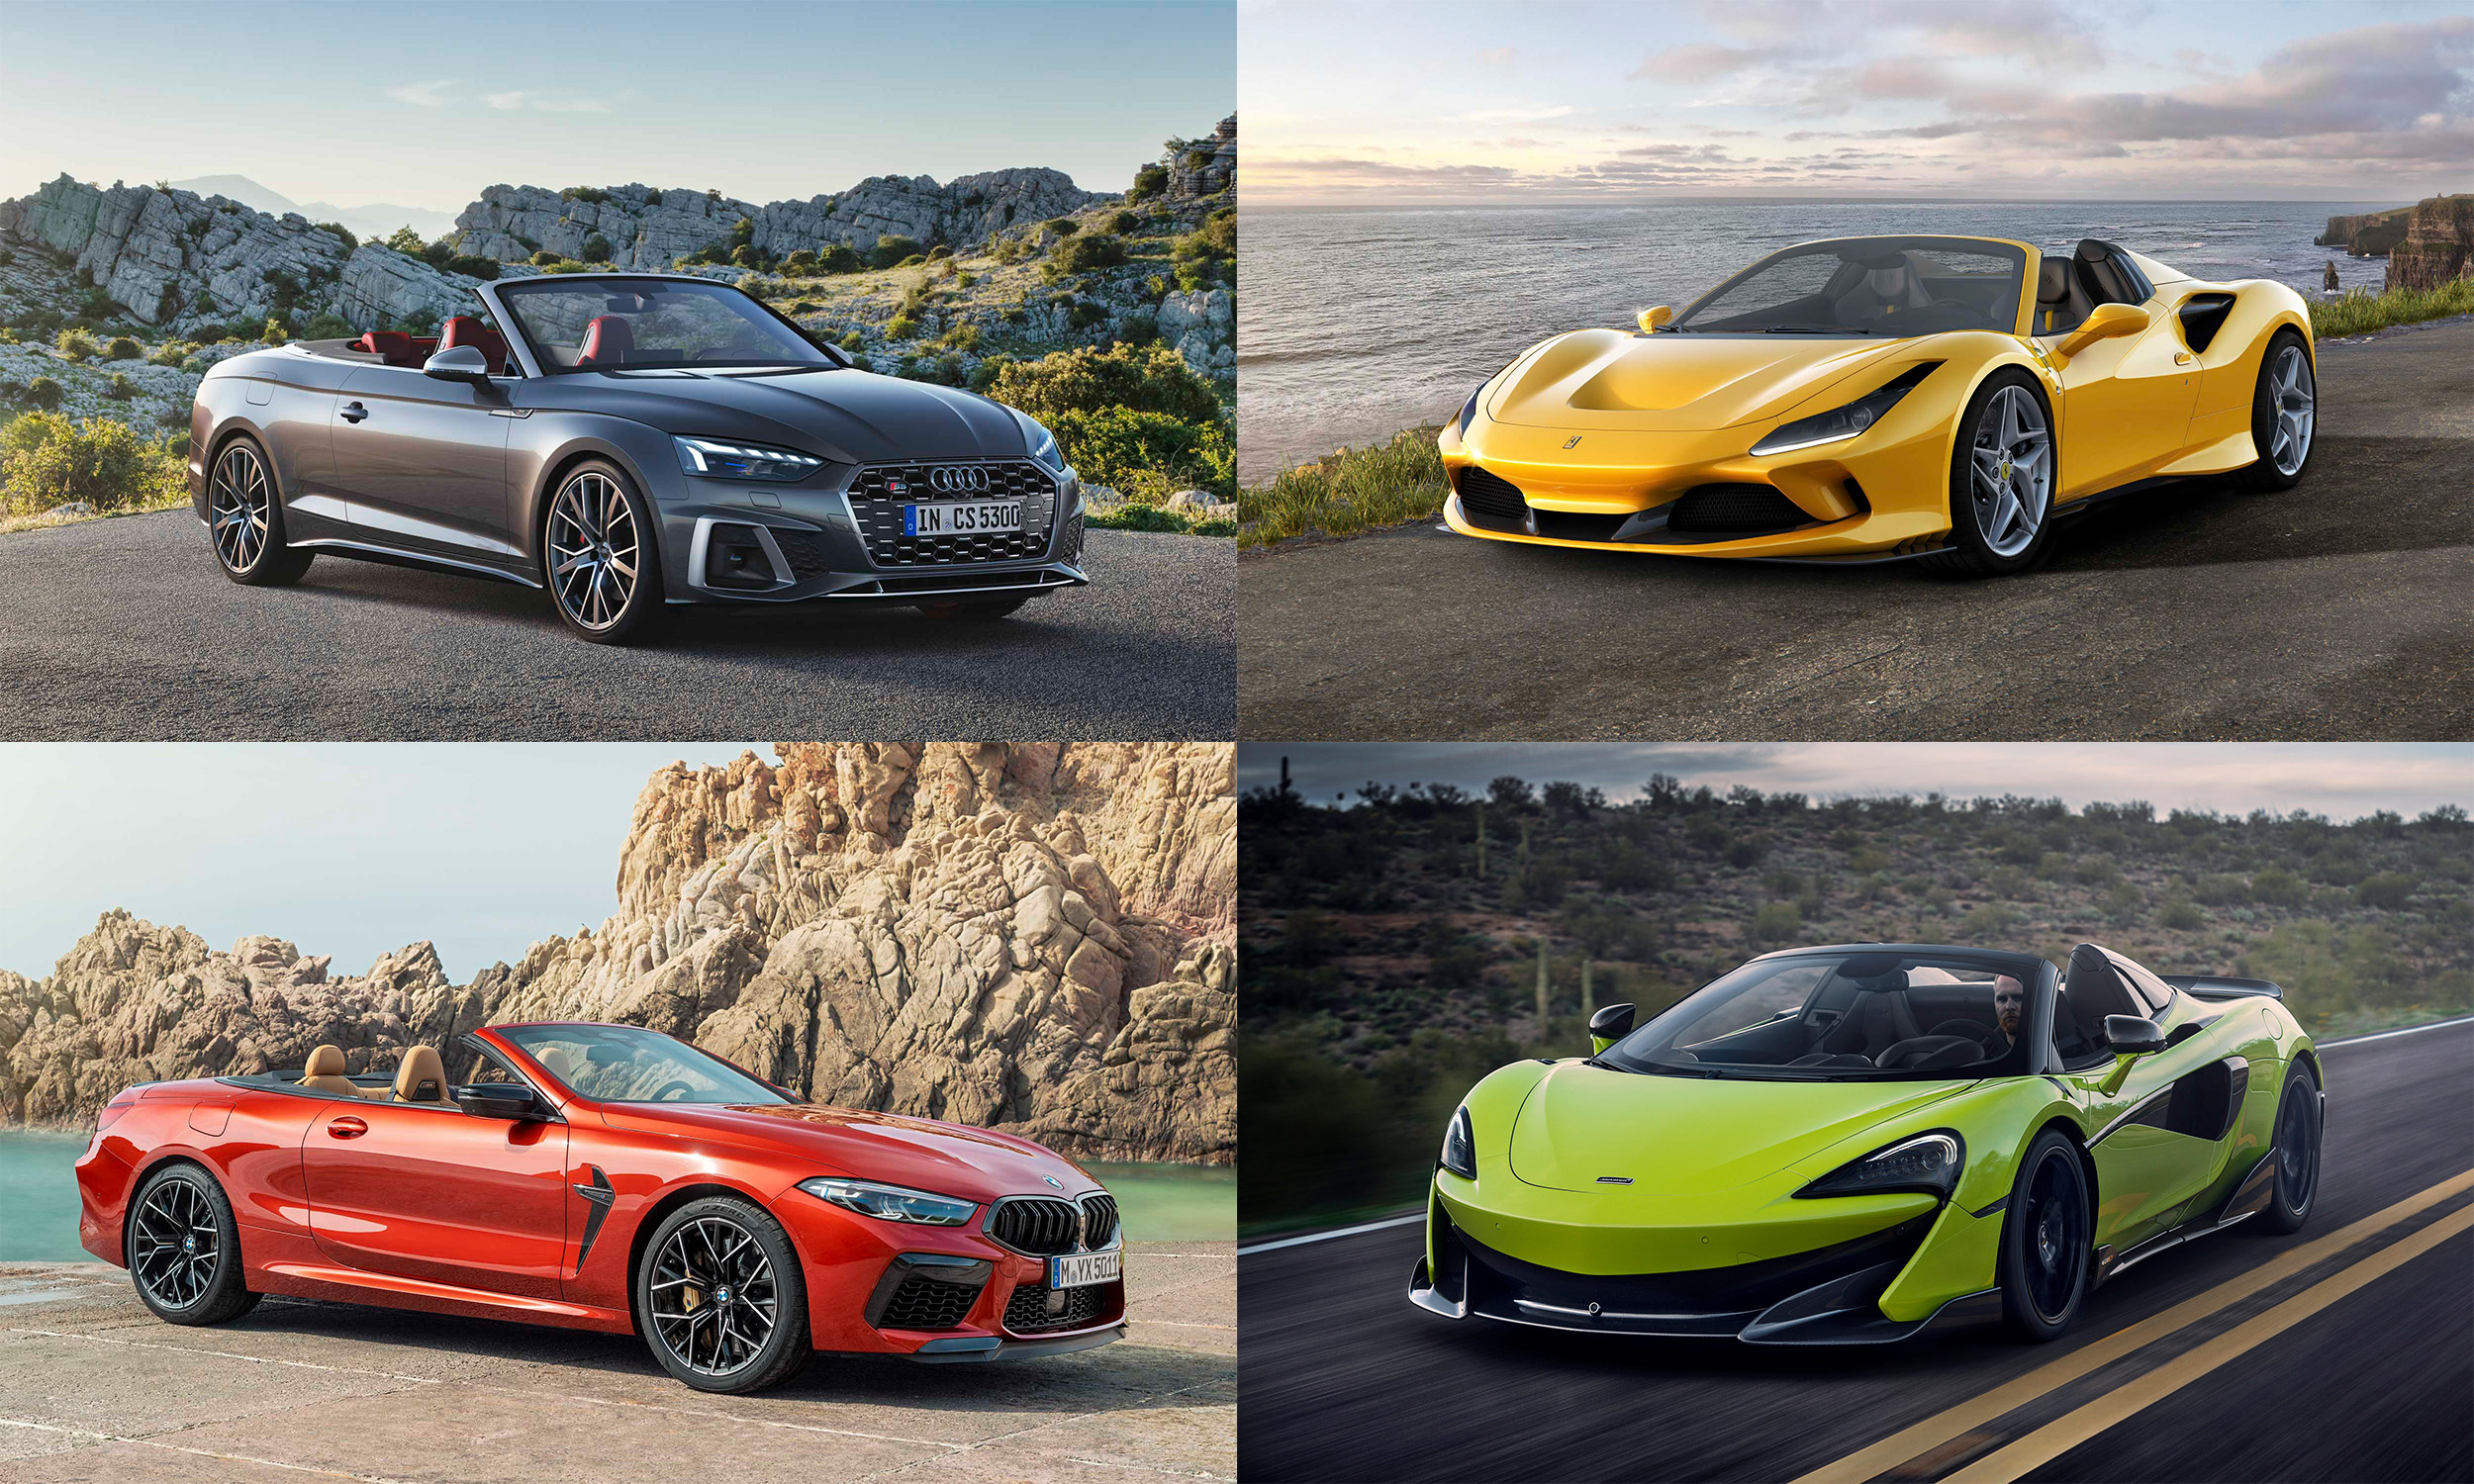 © Audi AG; Ferrari S.p.A.; McLaren Automotive Limited; BMW of North America